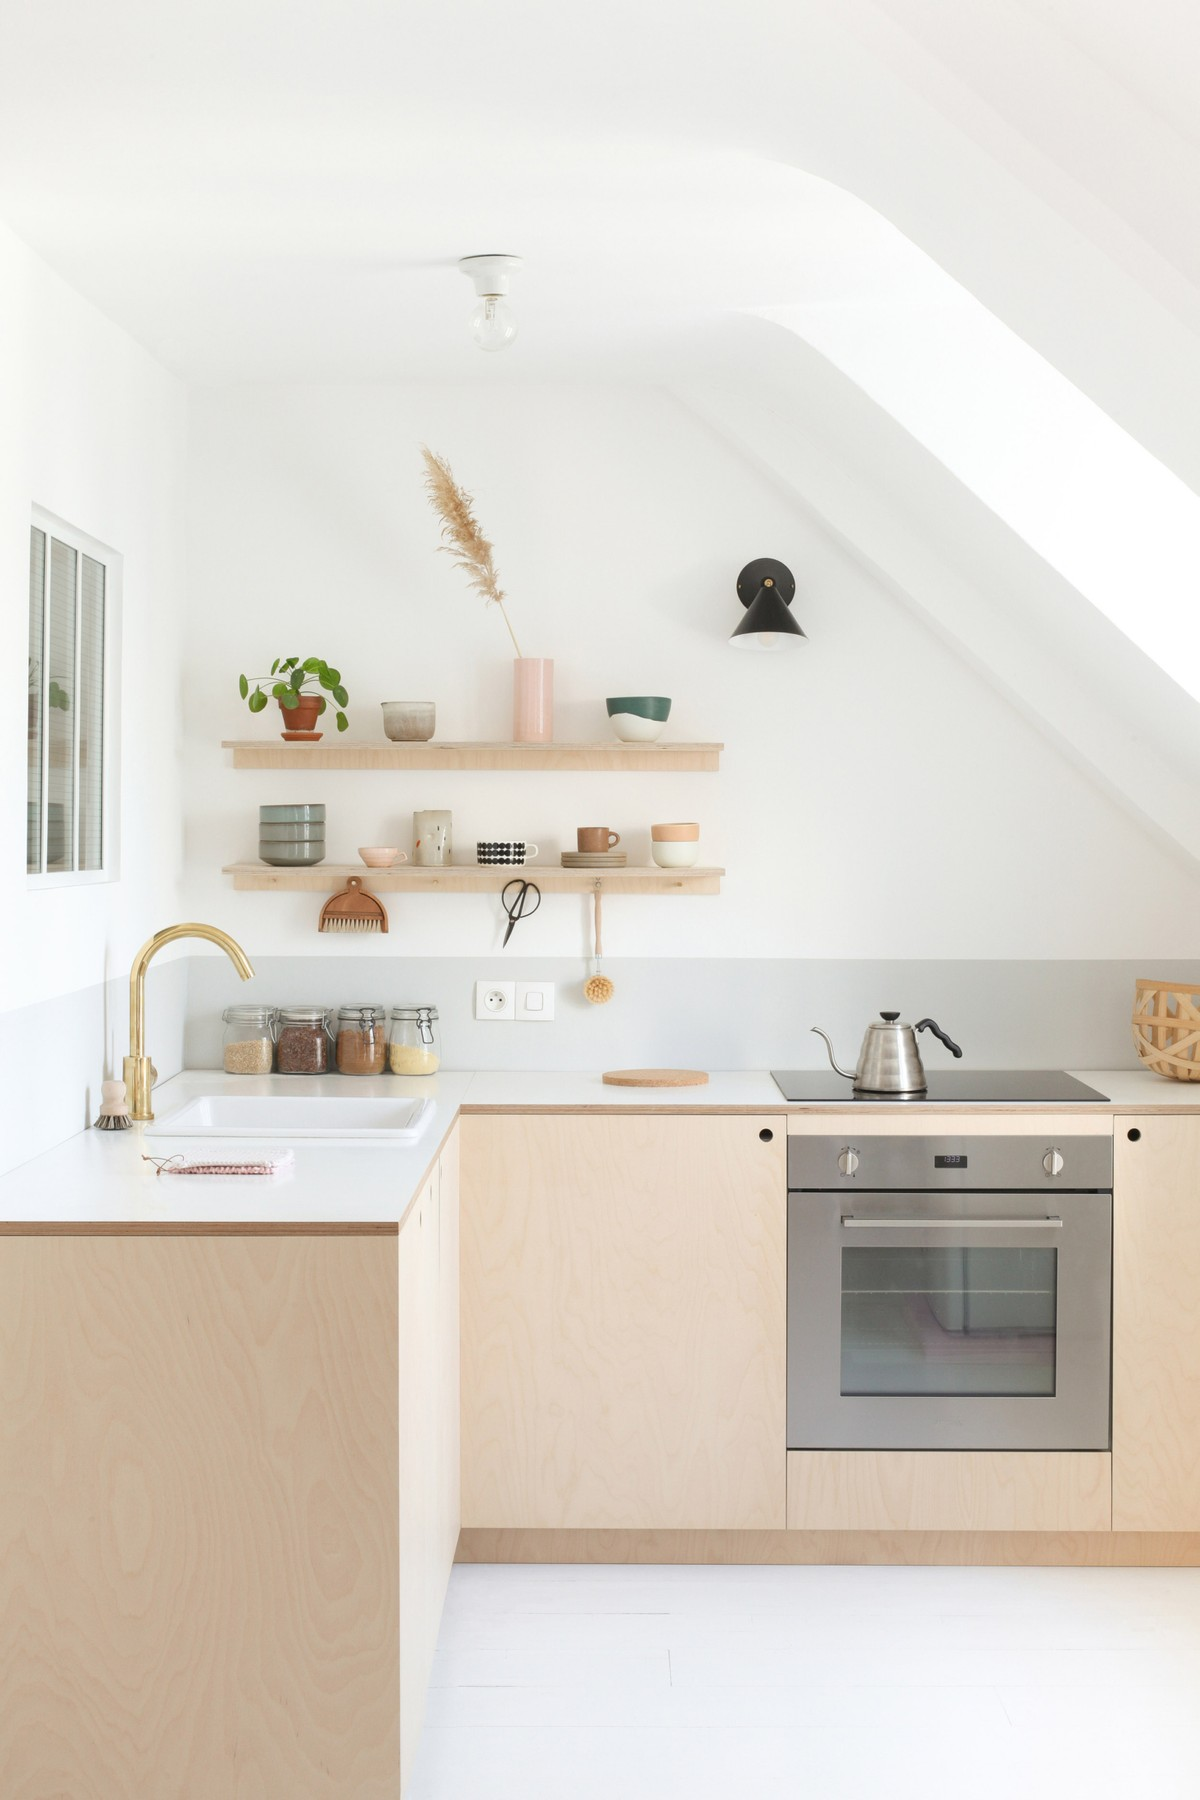 heju-apartment-paris-diy-minimalist-kitchen-with-plywood-cabinet-fronts-1-1466x2199.jpg